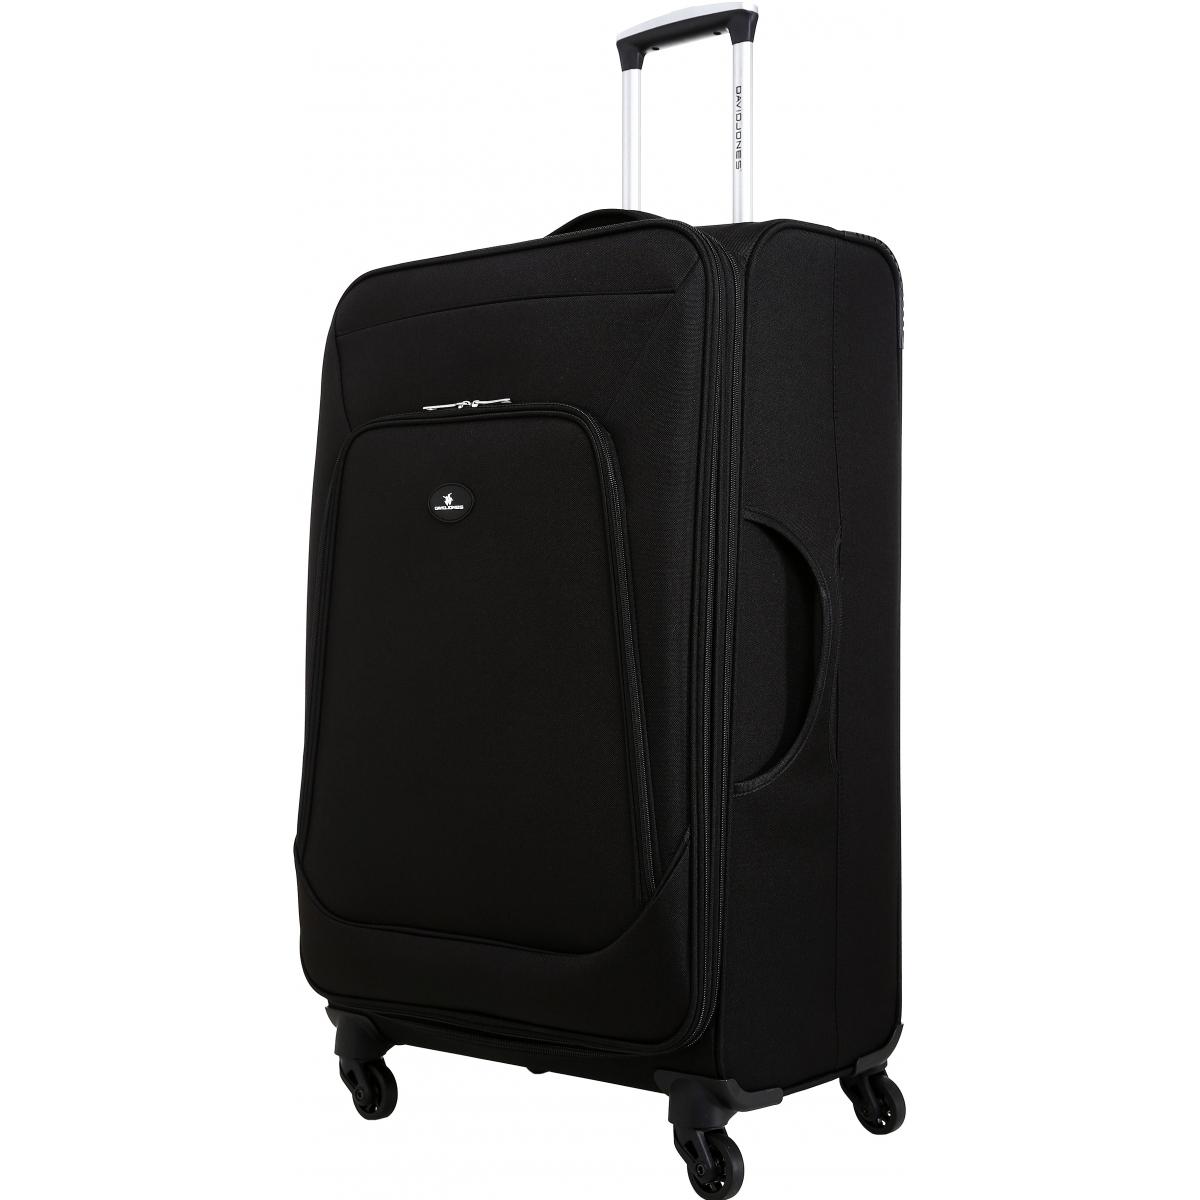 valise souple extensible david jones 67 cm taille m. Black Bedroom Furniture Sets. Home Design Ideas